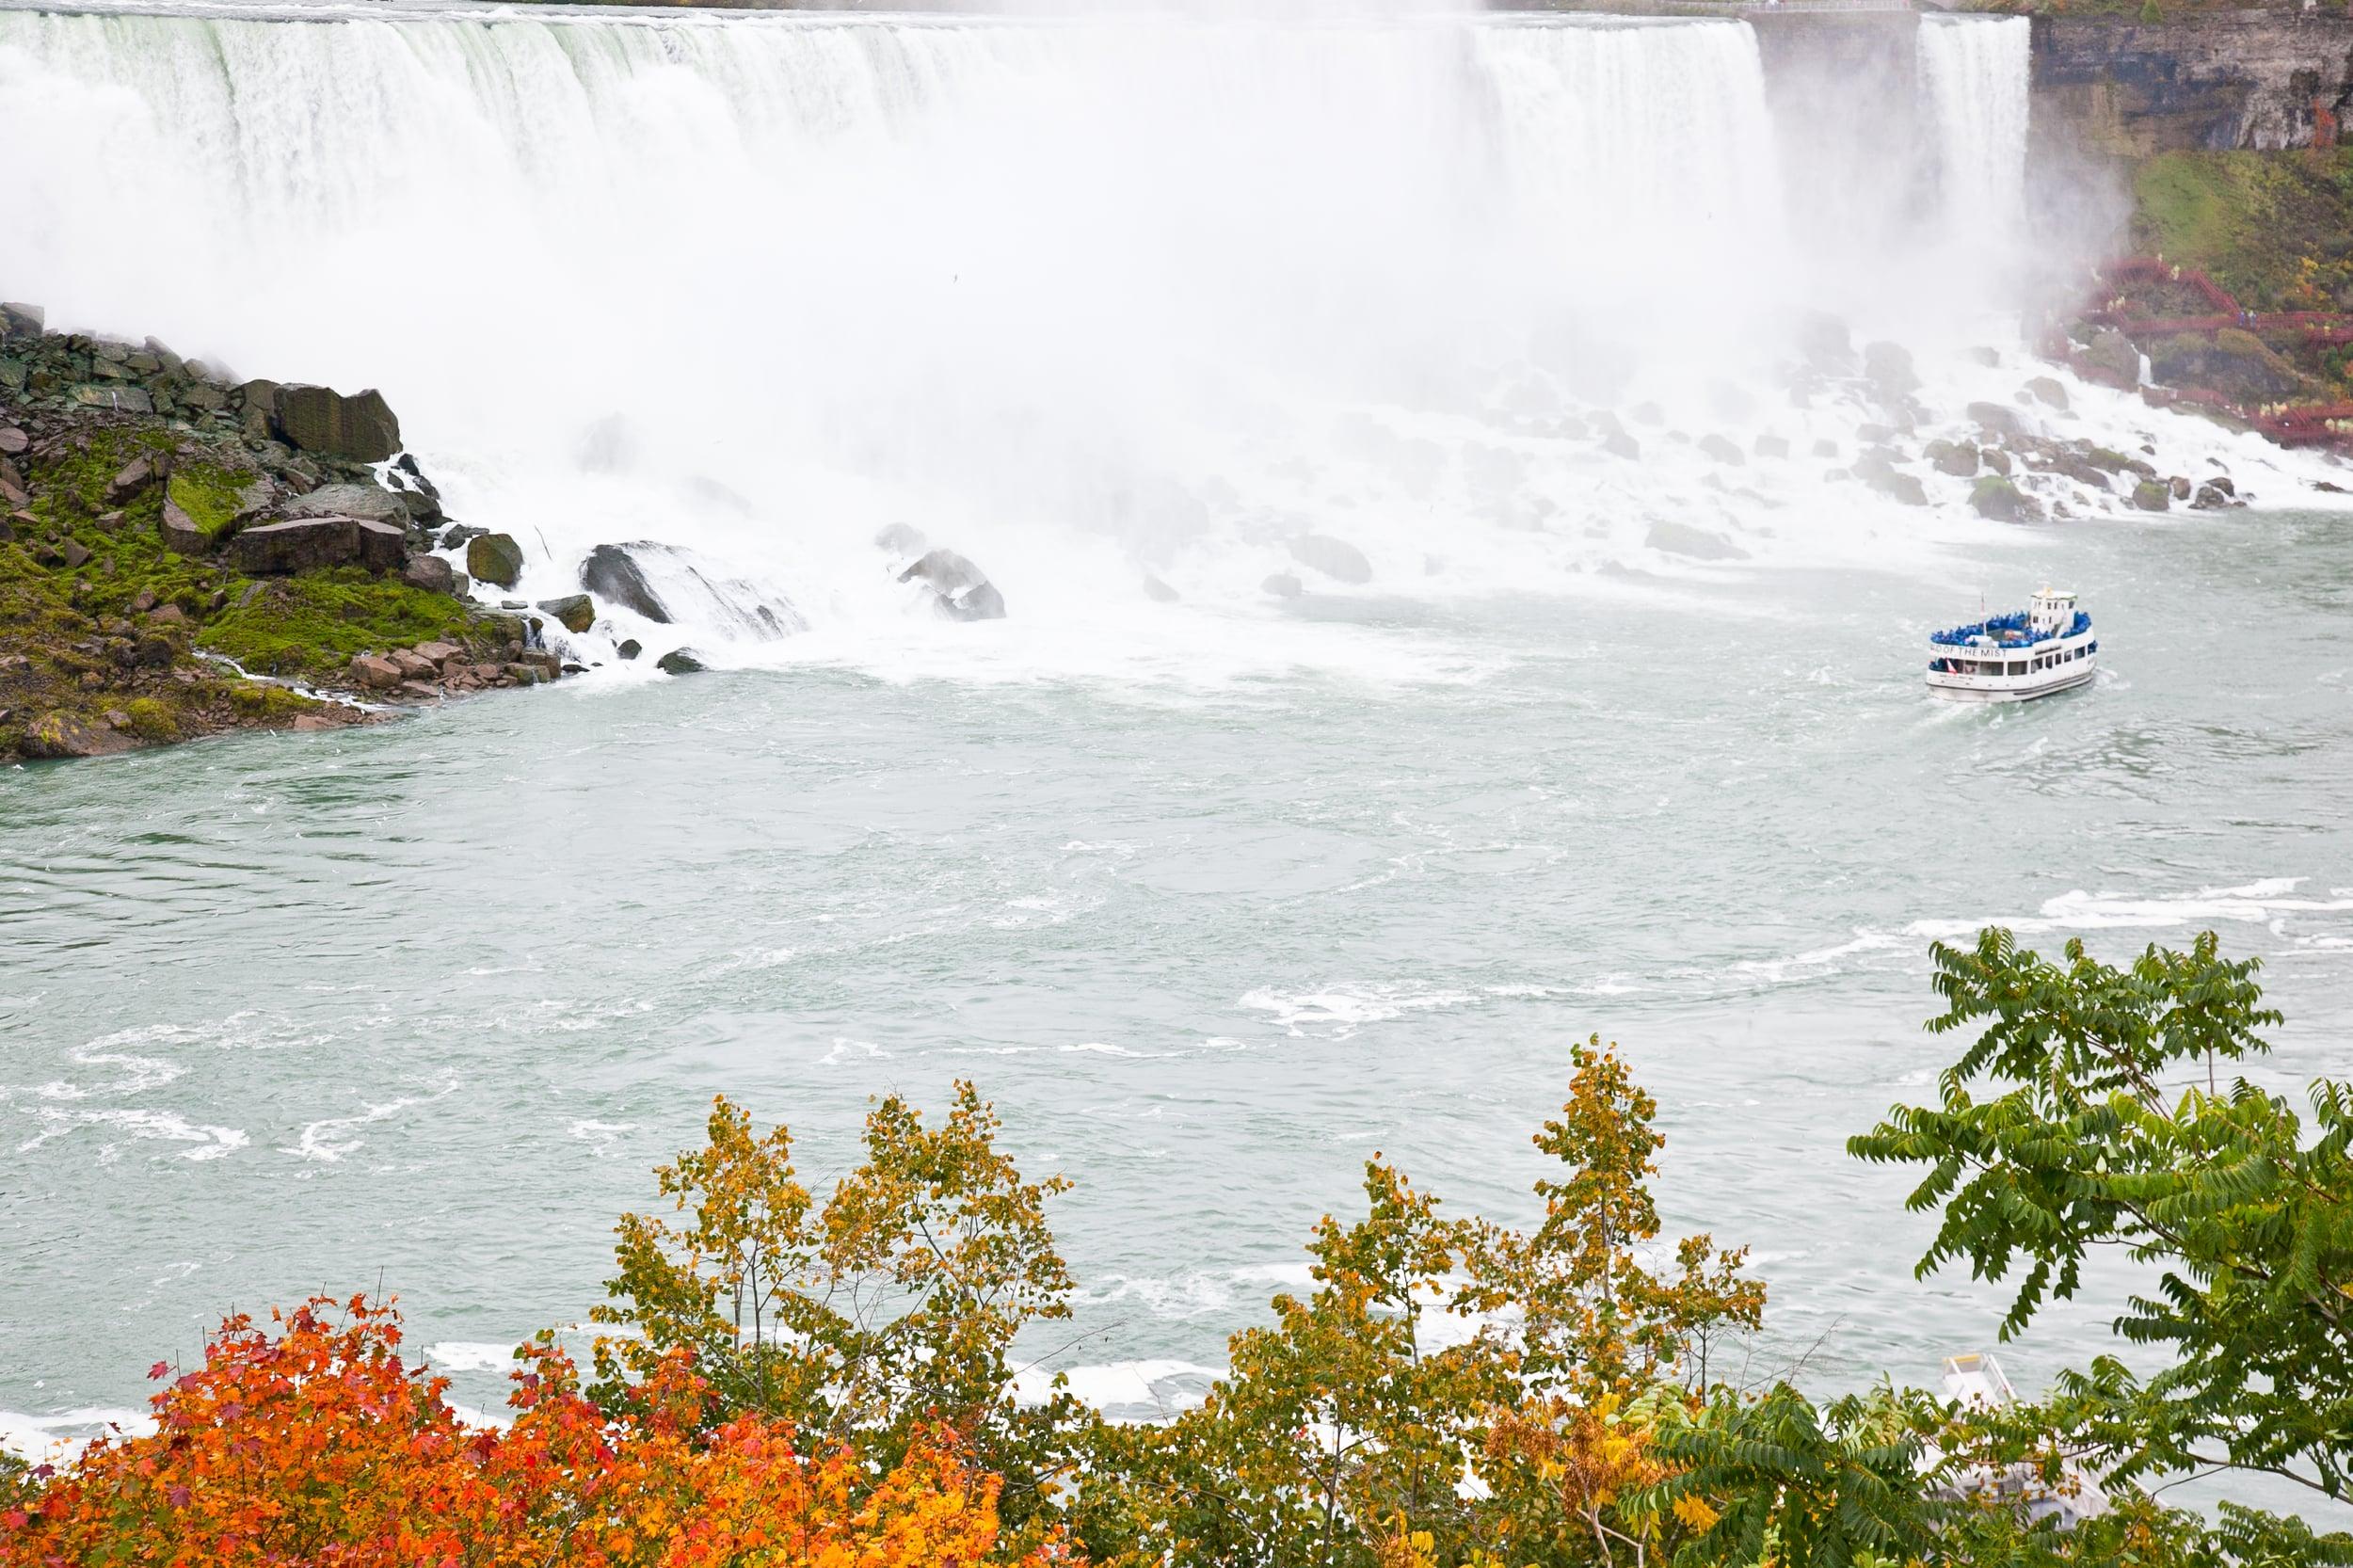 trisa-taro-niagara-falls-view-canada.jpg